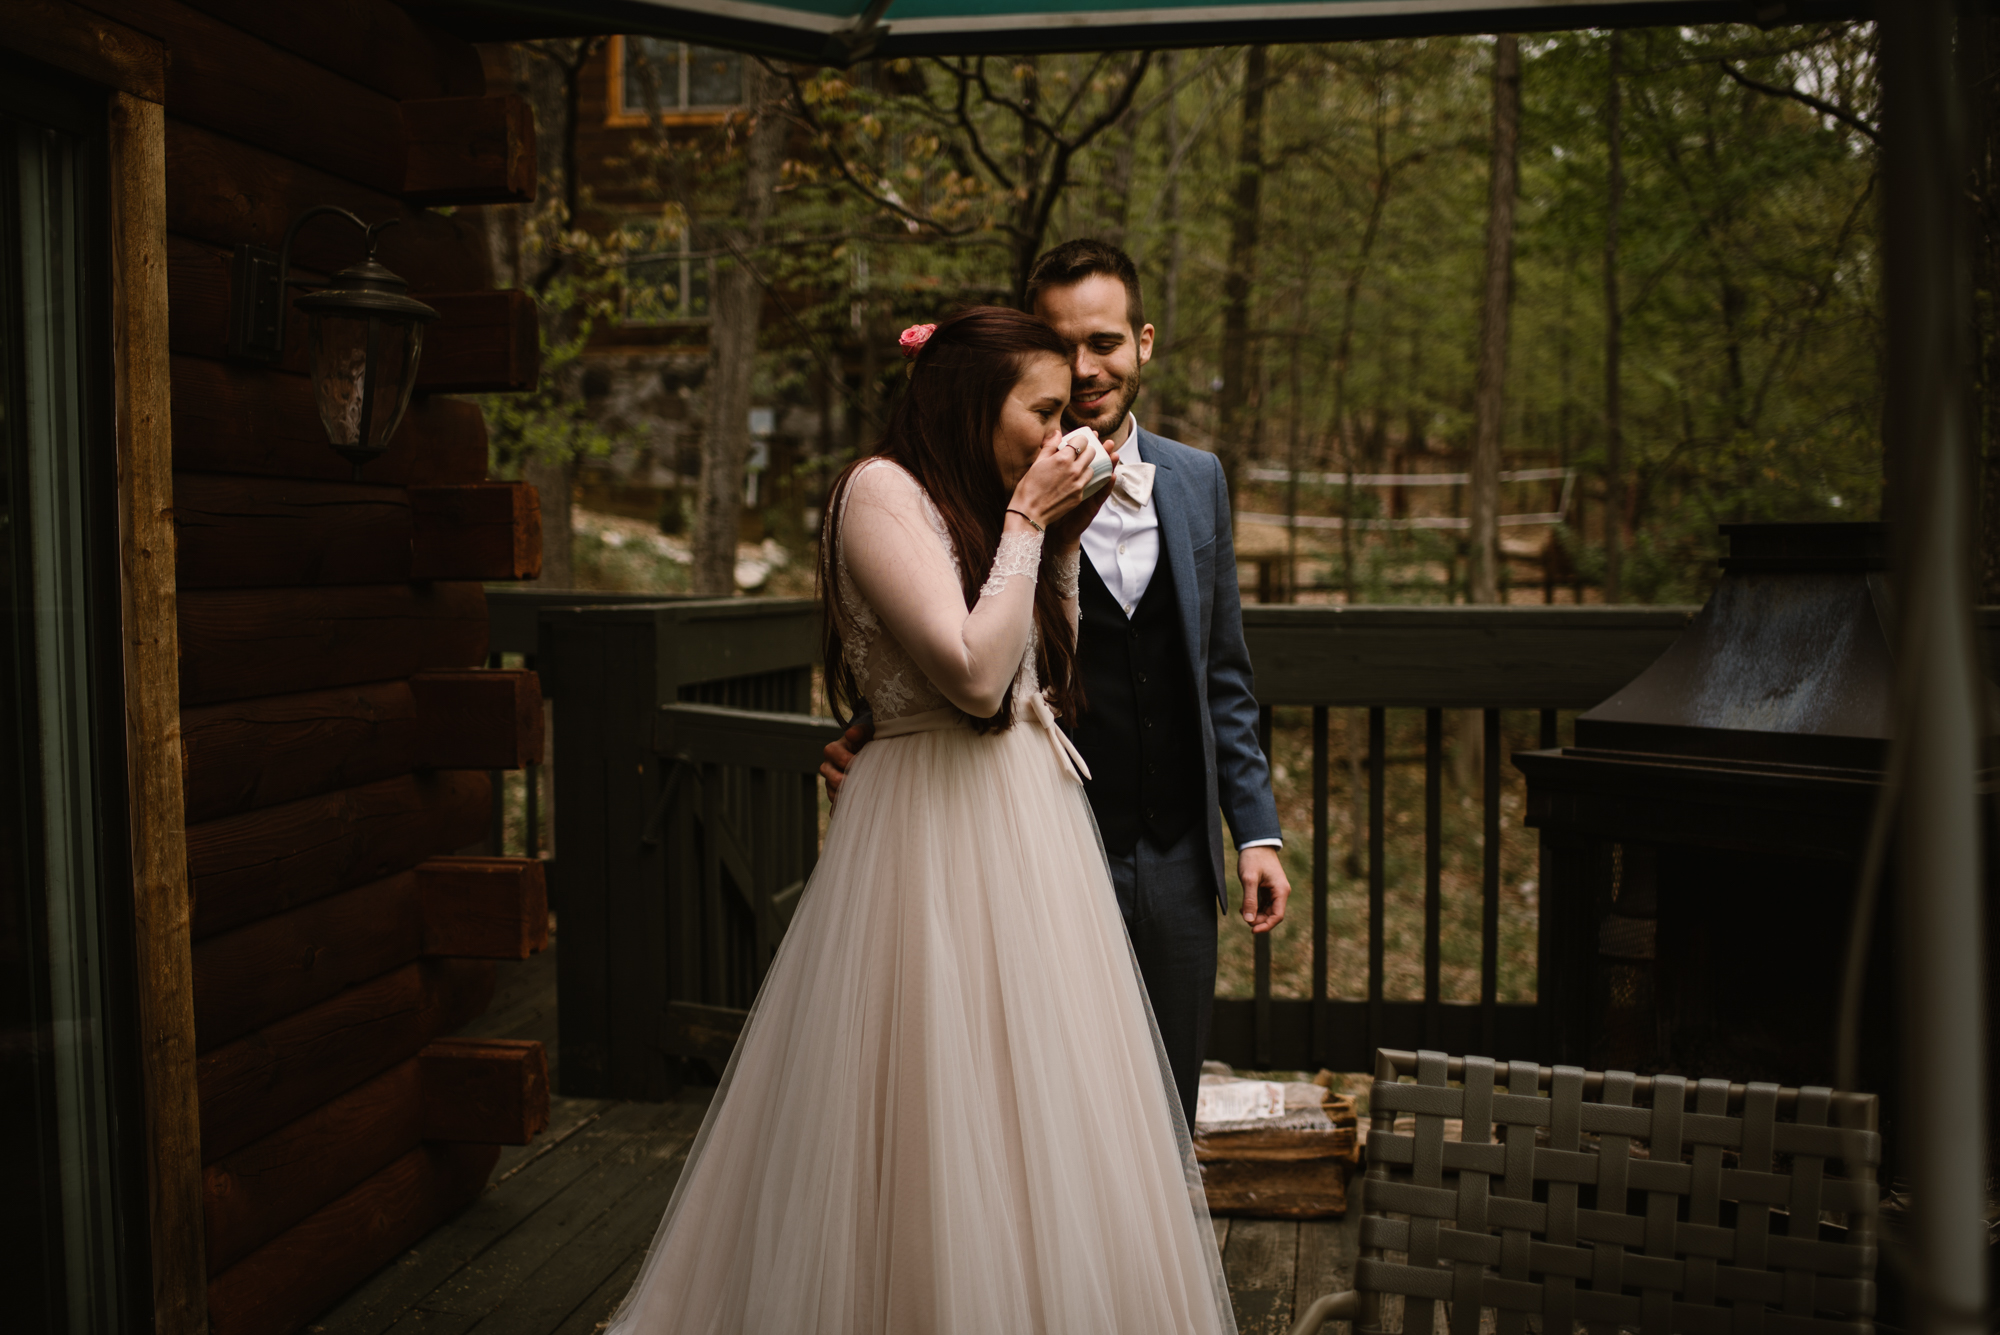 Paula and Andrew - Small Adventurous Wedding in Shenandoah National Park - Blue Ridge Mountain Wedding - White Sails Creative - Mountain Elopement_50.jpg